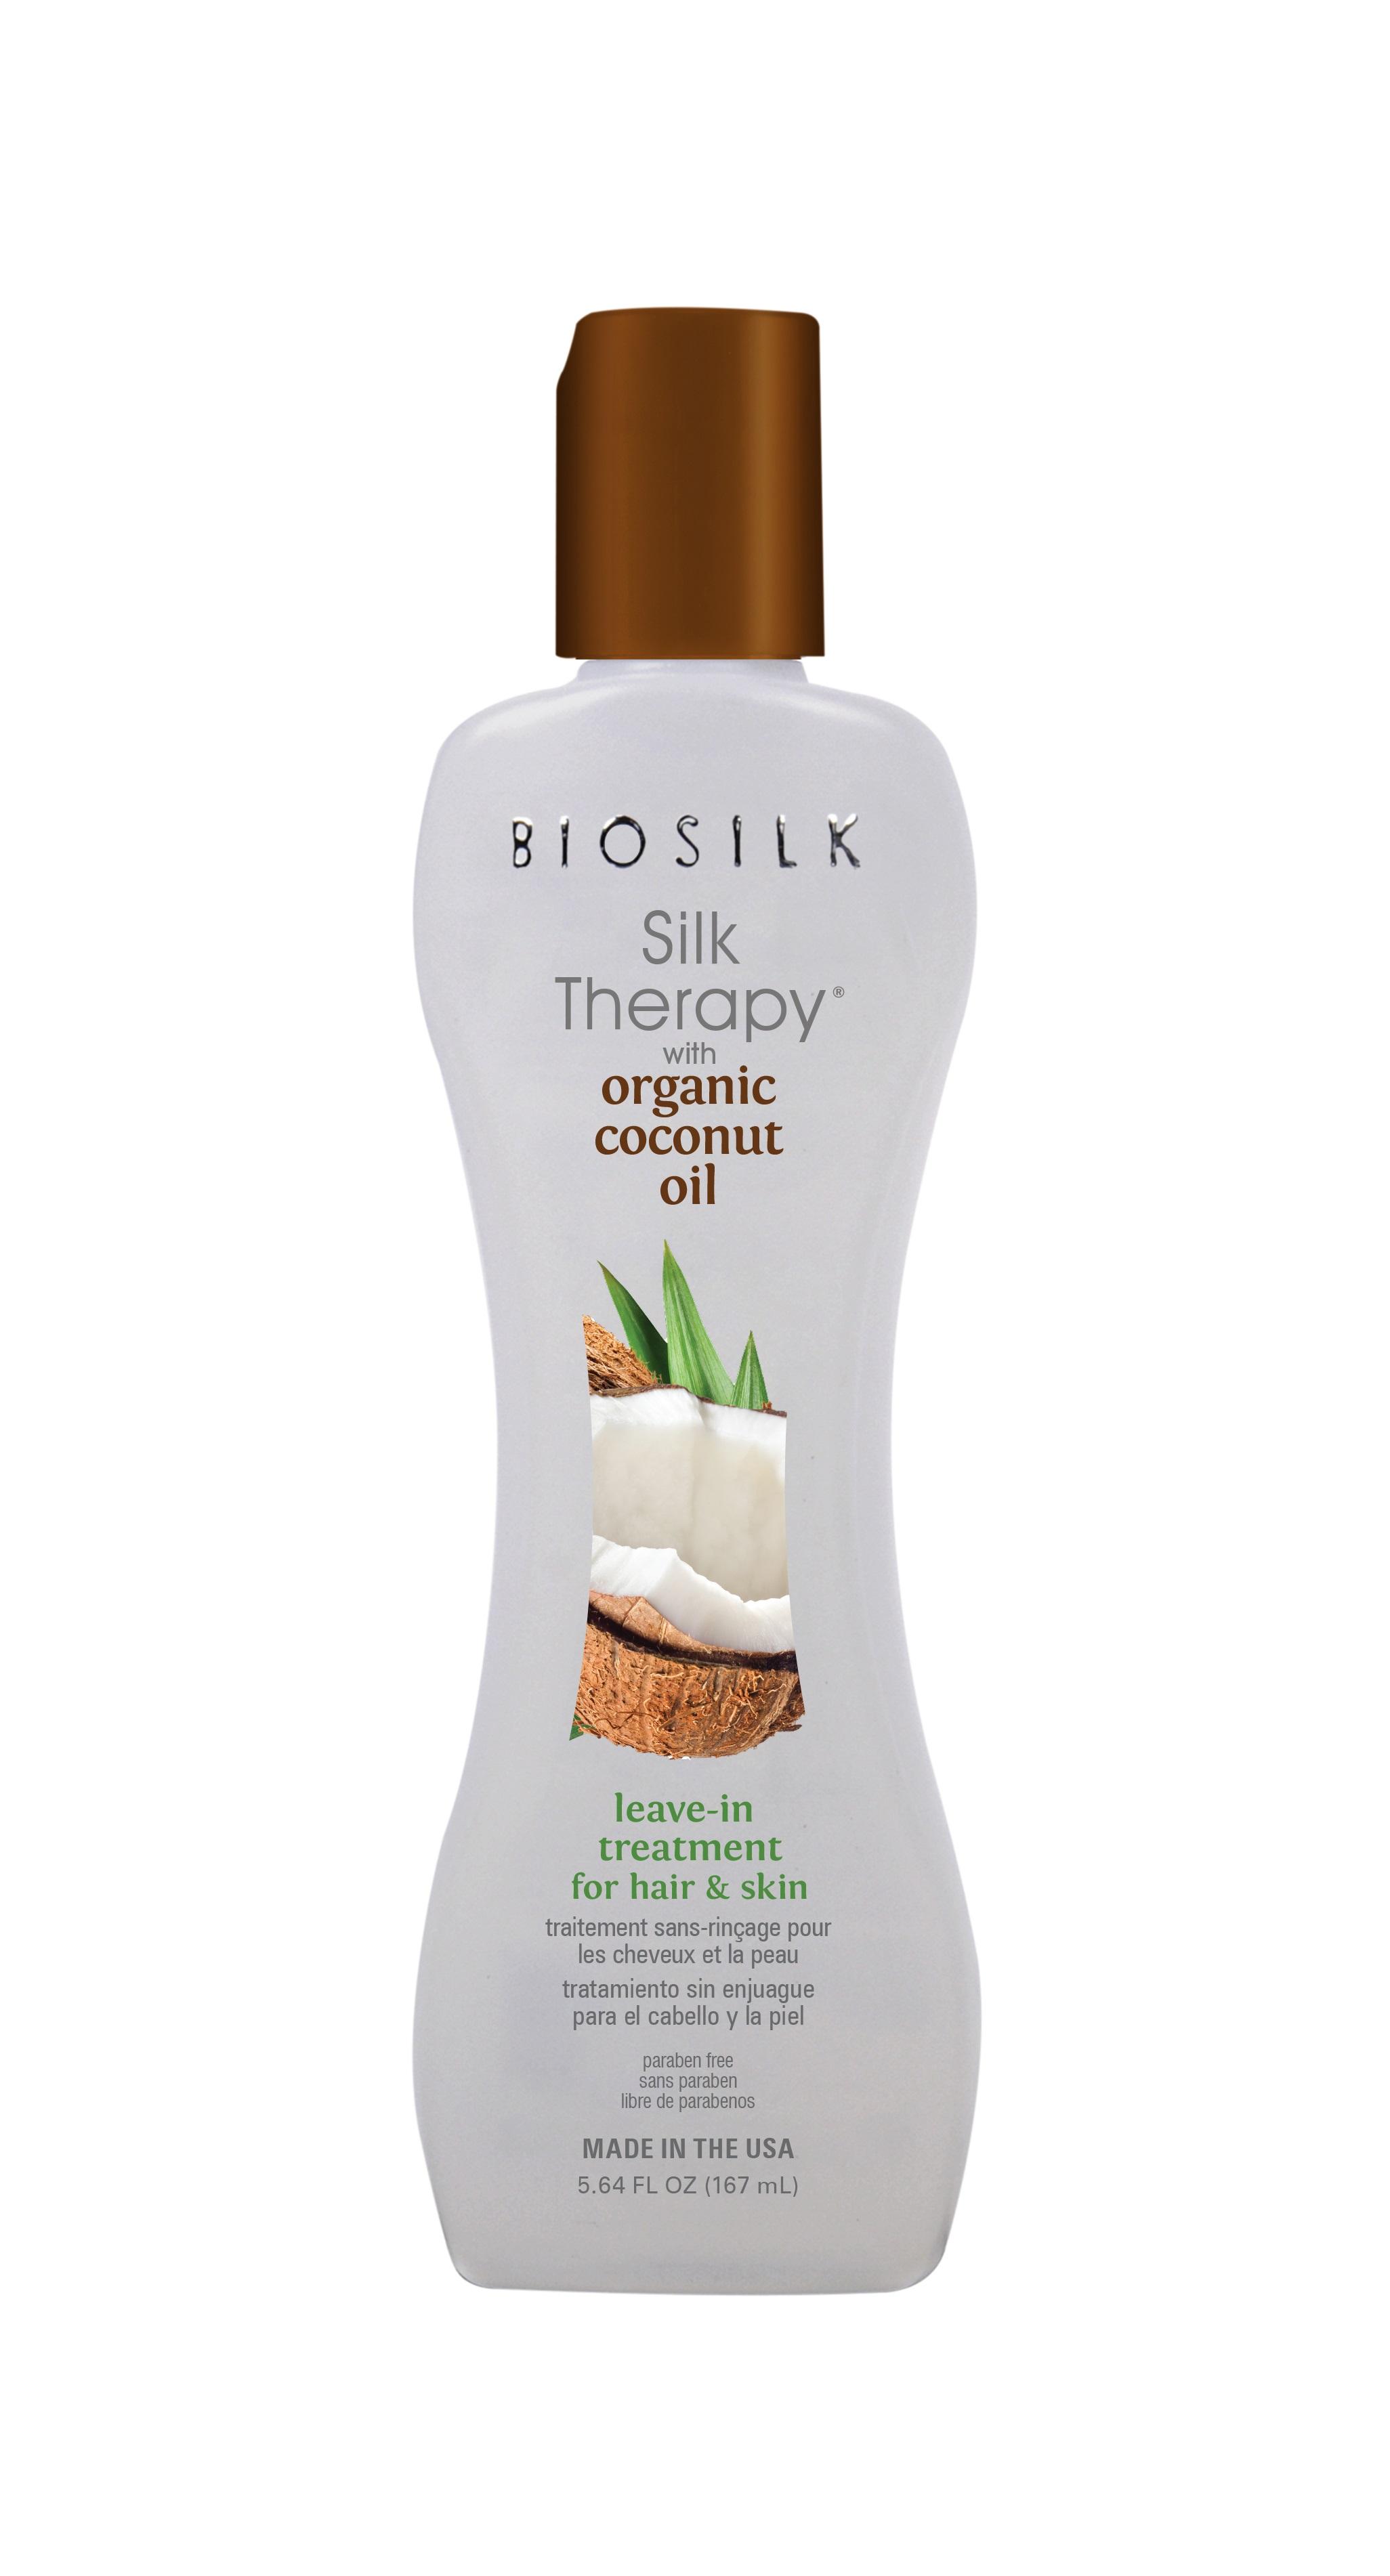 Farouk Systems Launches BioSilk Silk Therapy with Organic Coconut Oil